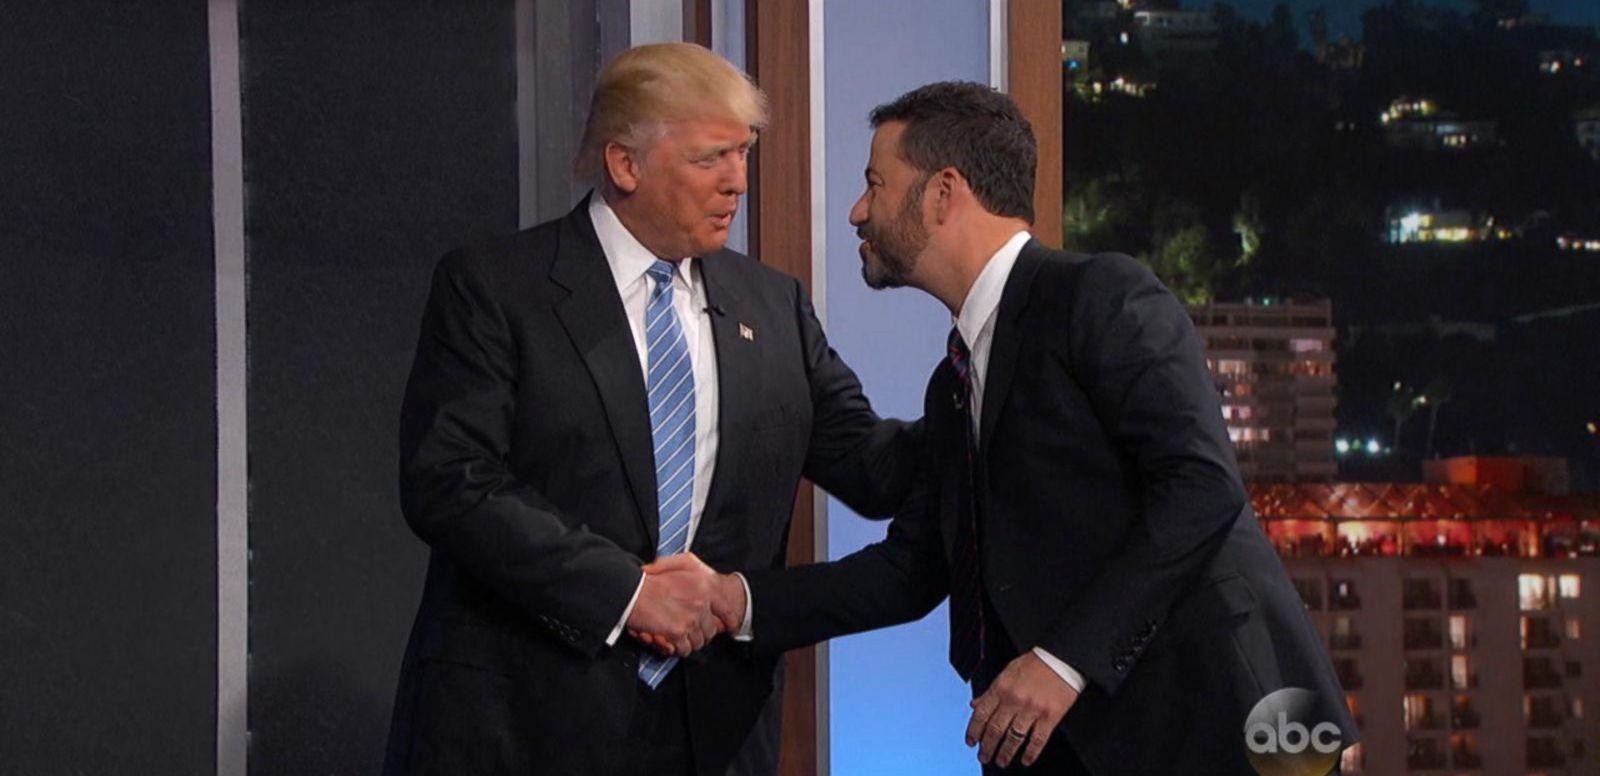 VIDEO: Donald Trump Visits 'Jimmy Kimmel Live!'